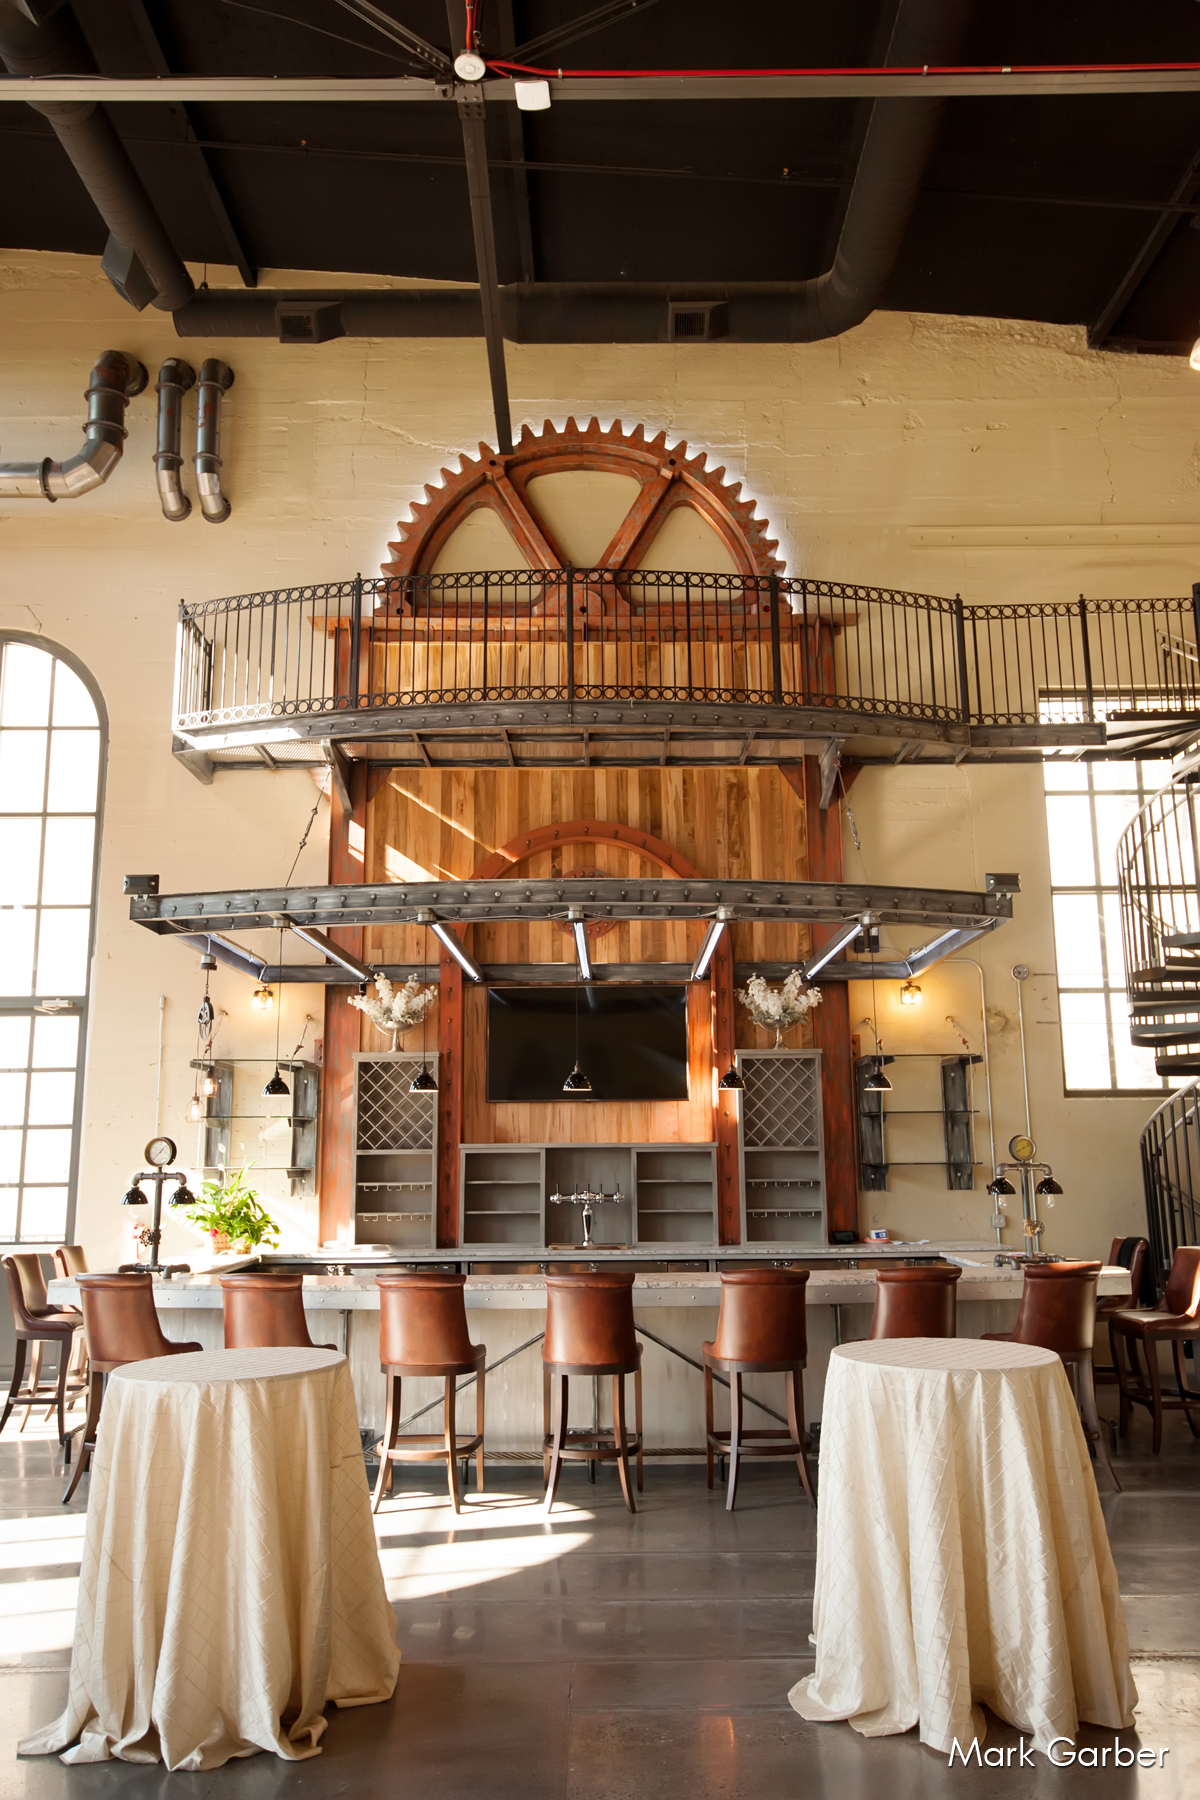 steam-plant-dayton-wedding-event-venue-elite-catering-mark-garber_001.jpg